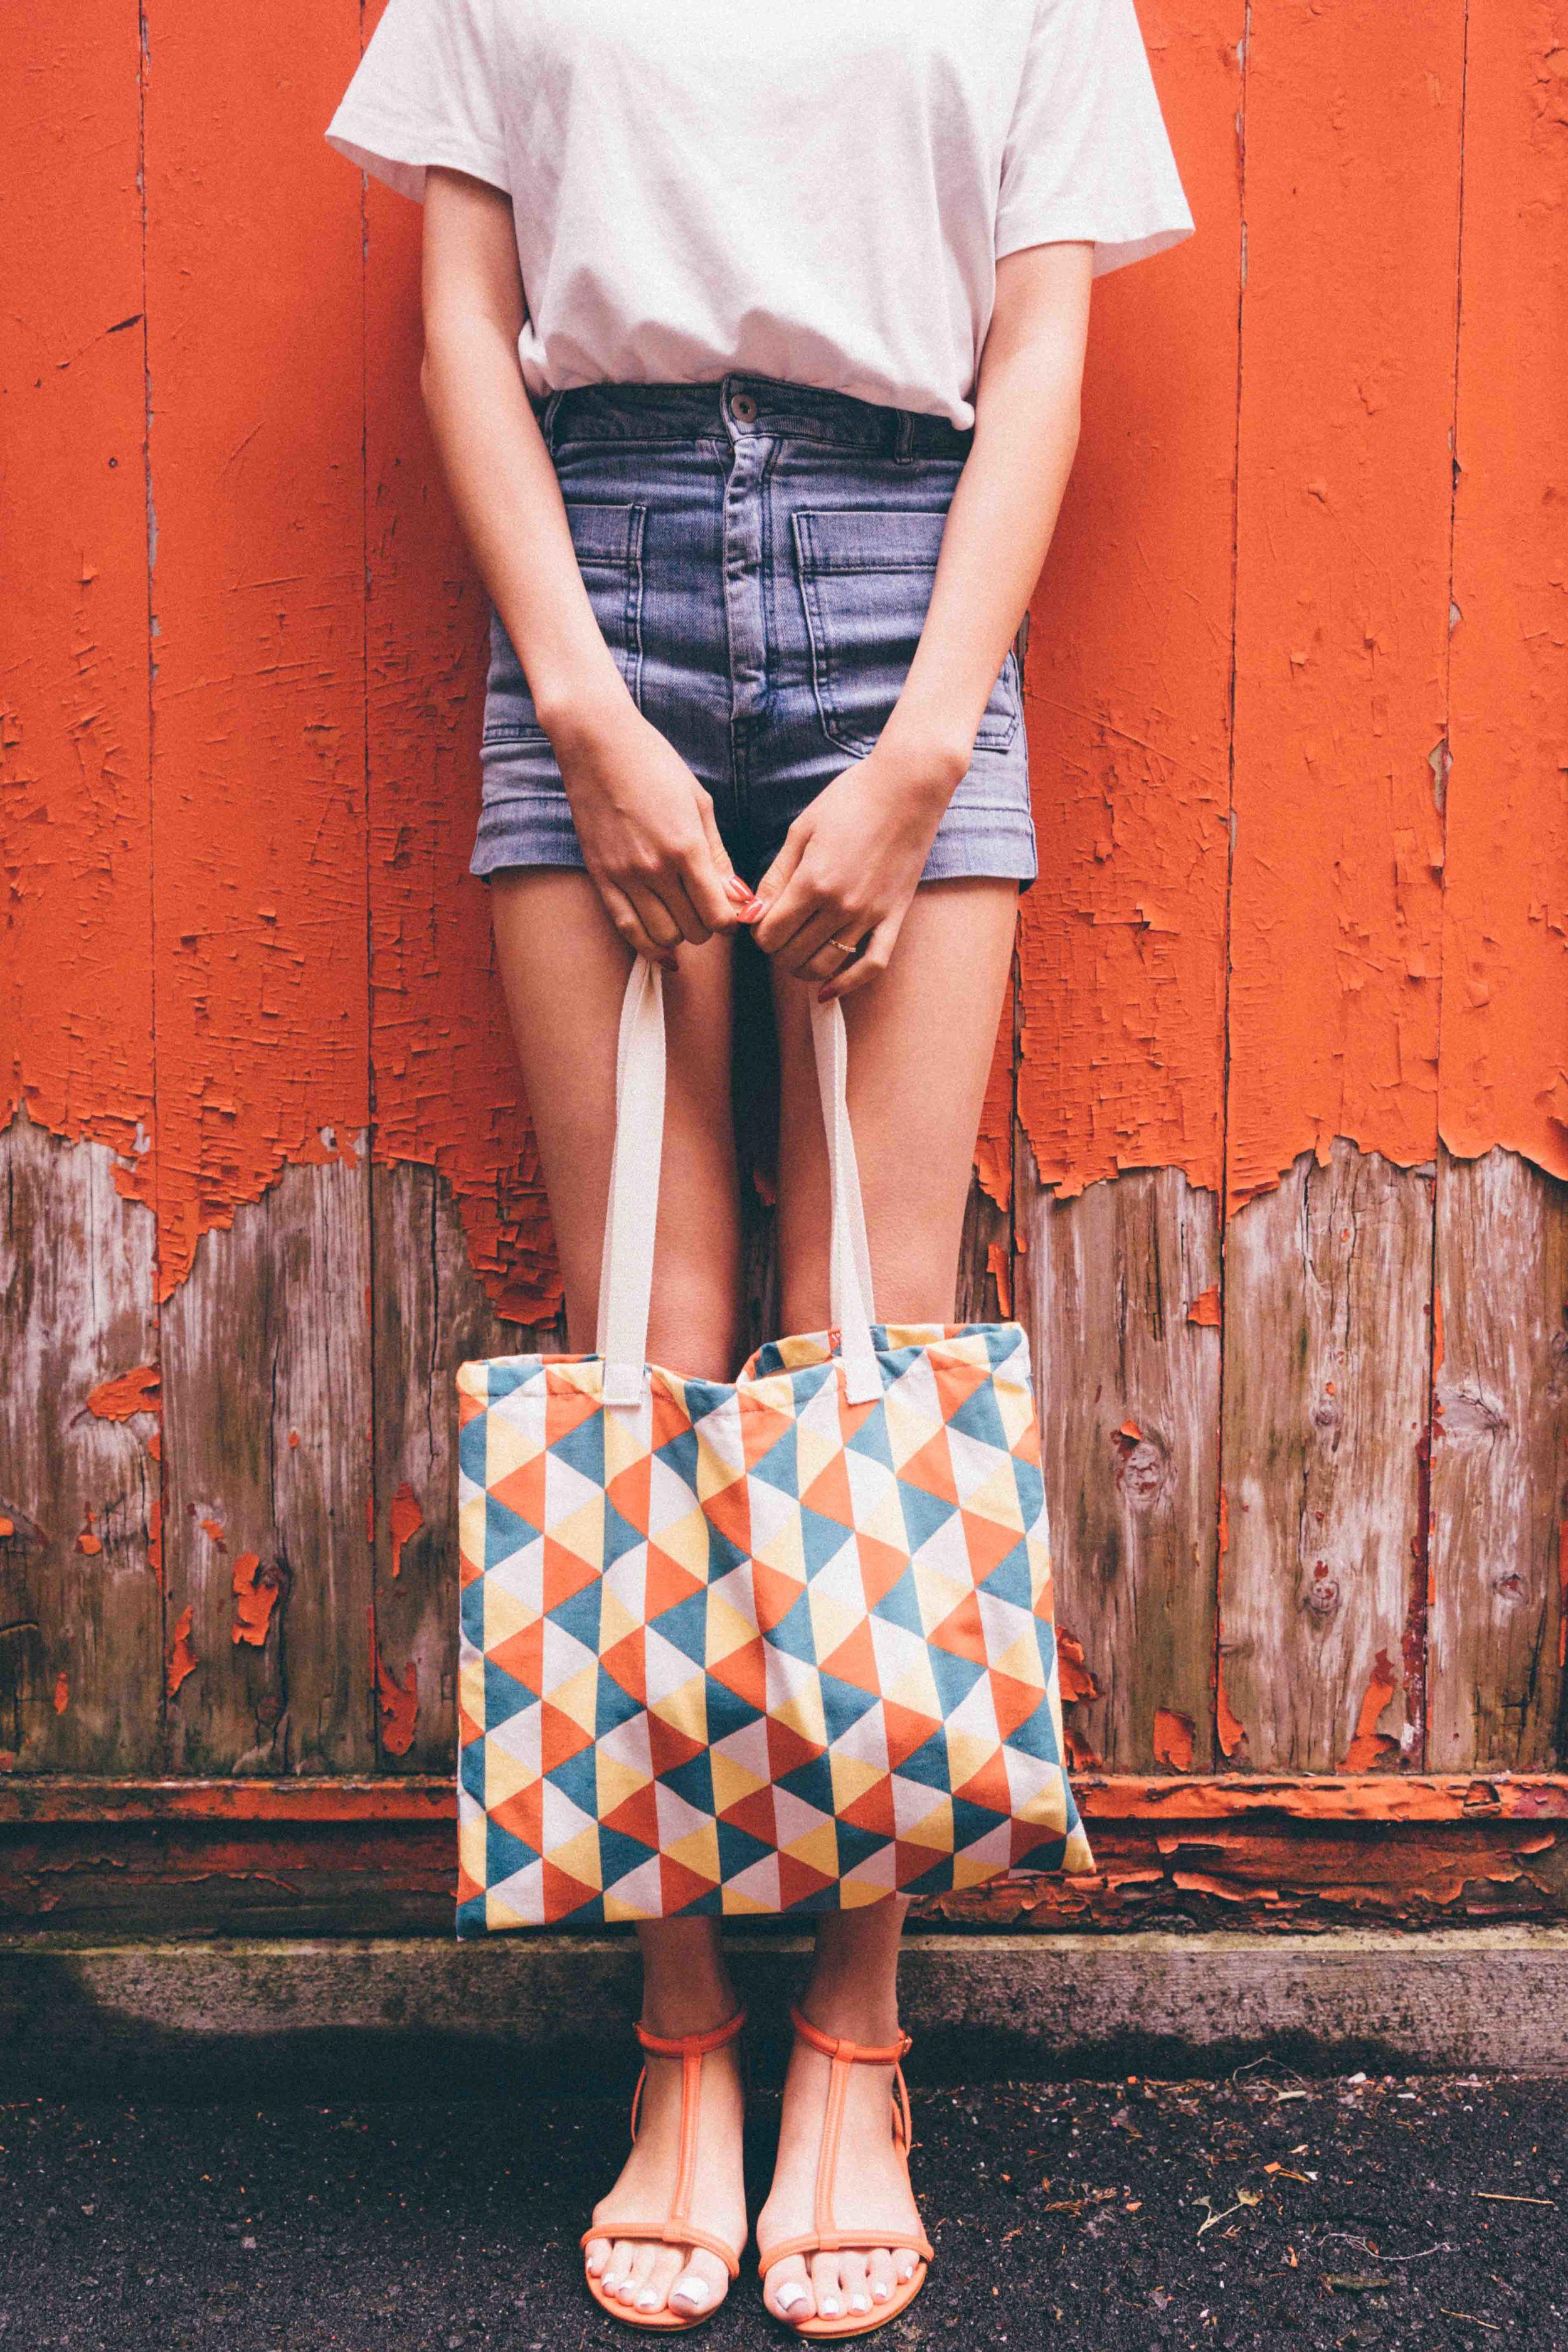 TaobaoT-shirt  |   Zara   Shorts |Flea Market Bag |   H&M    Sandals